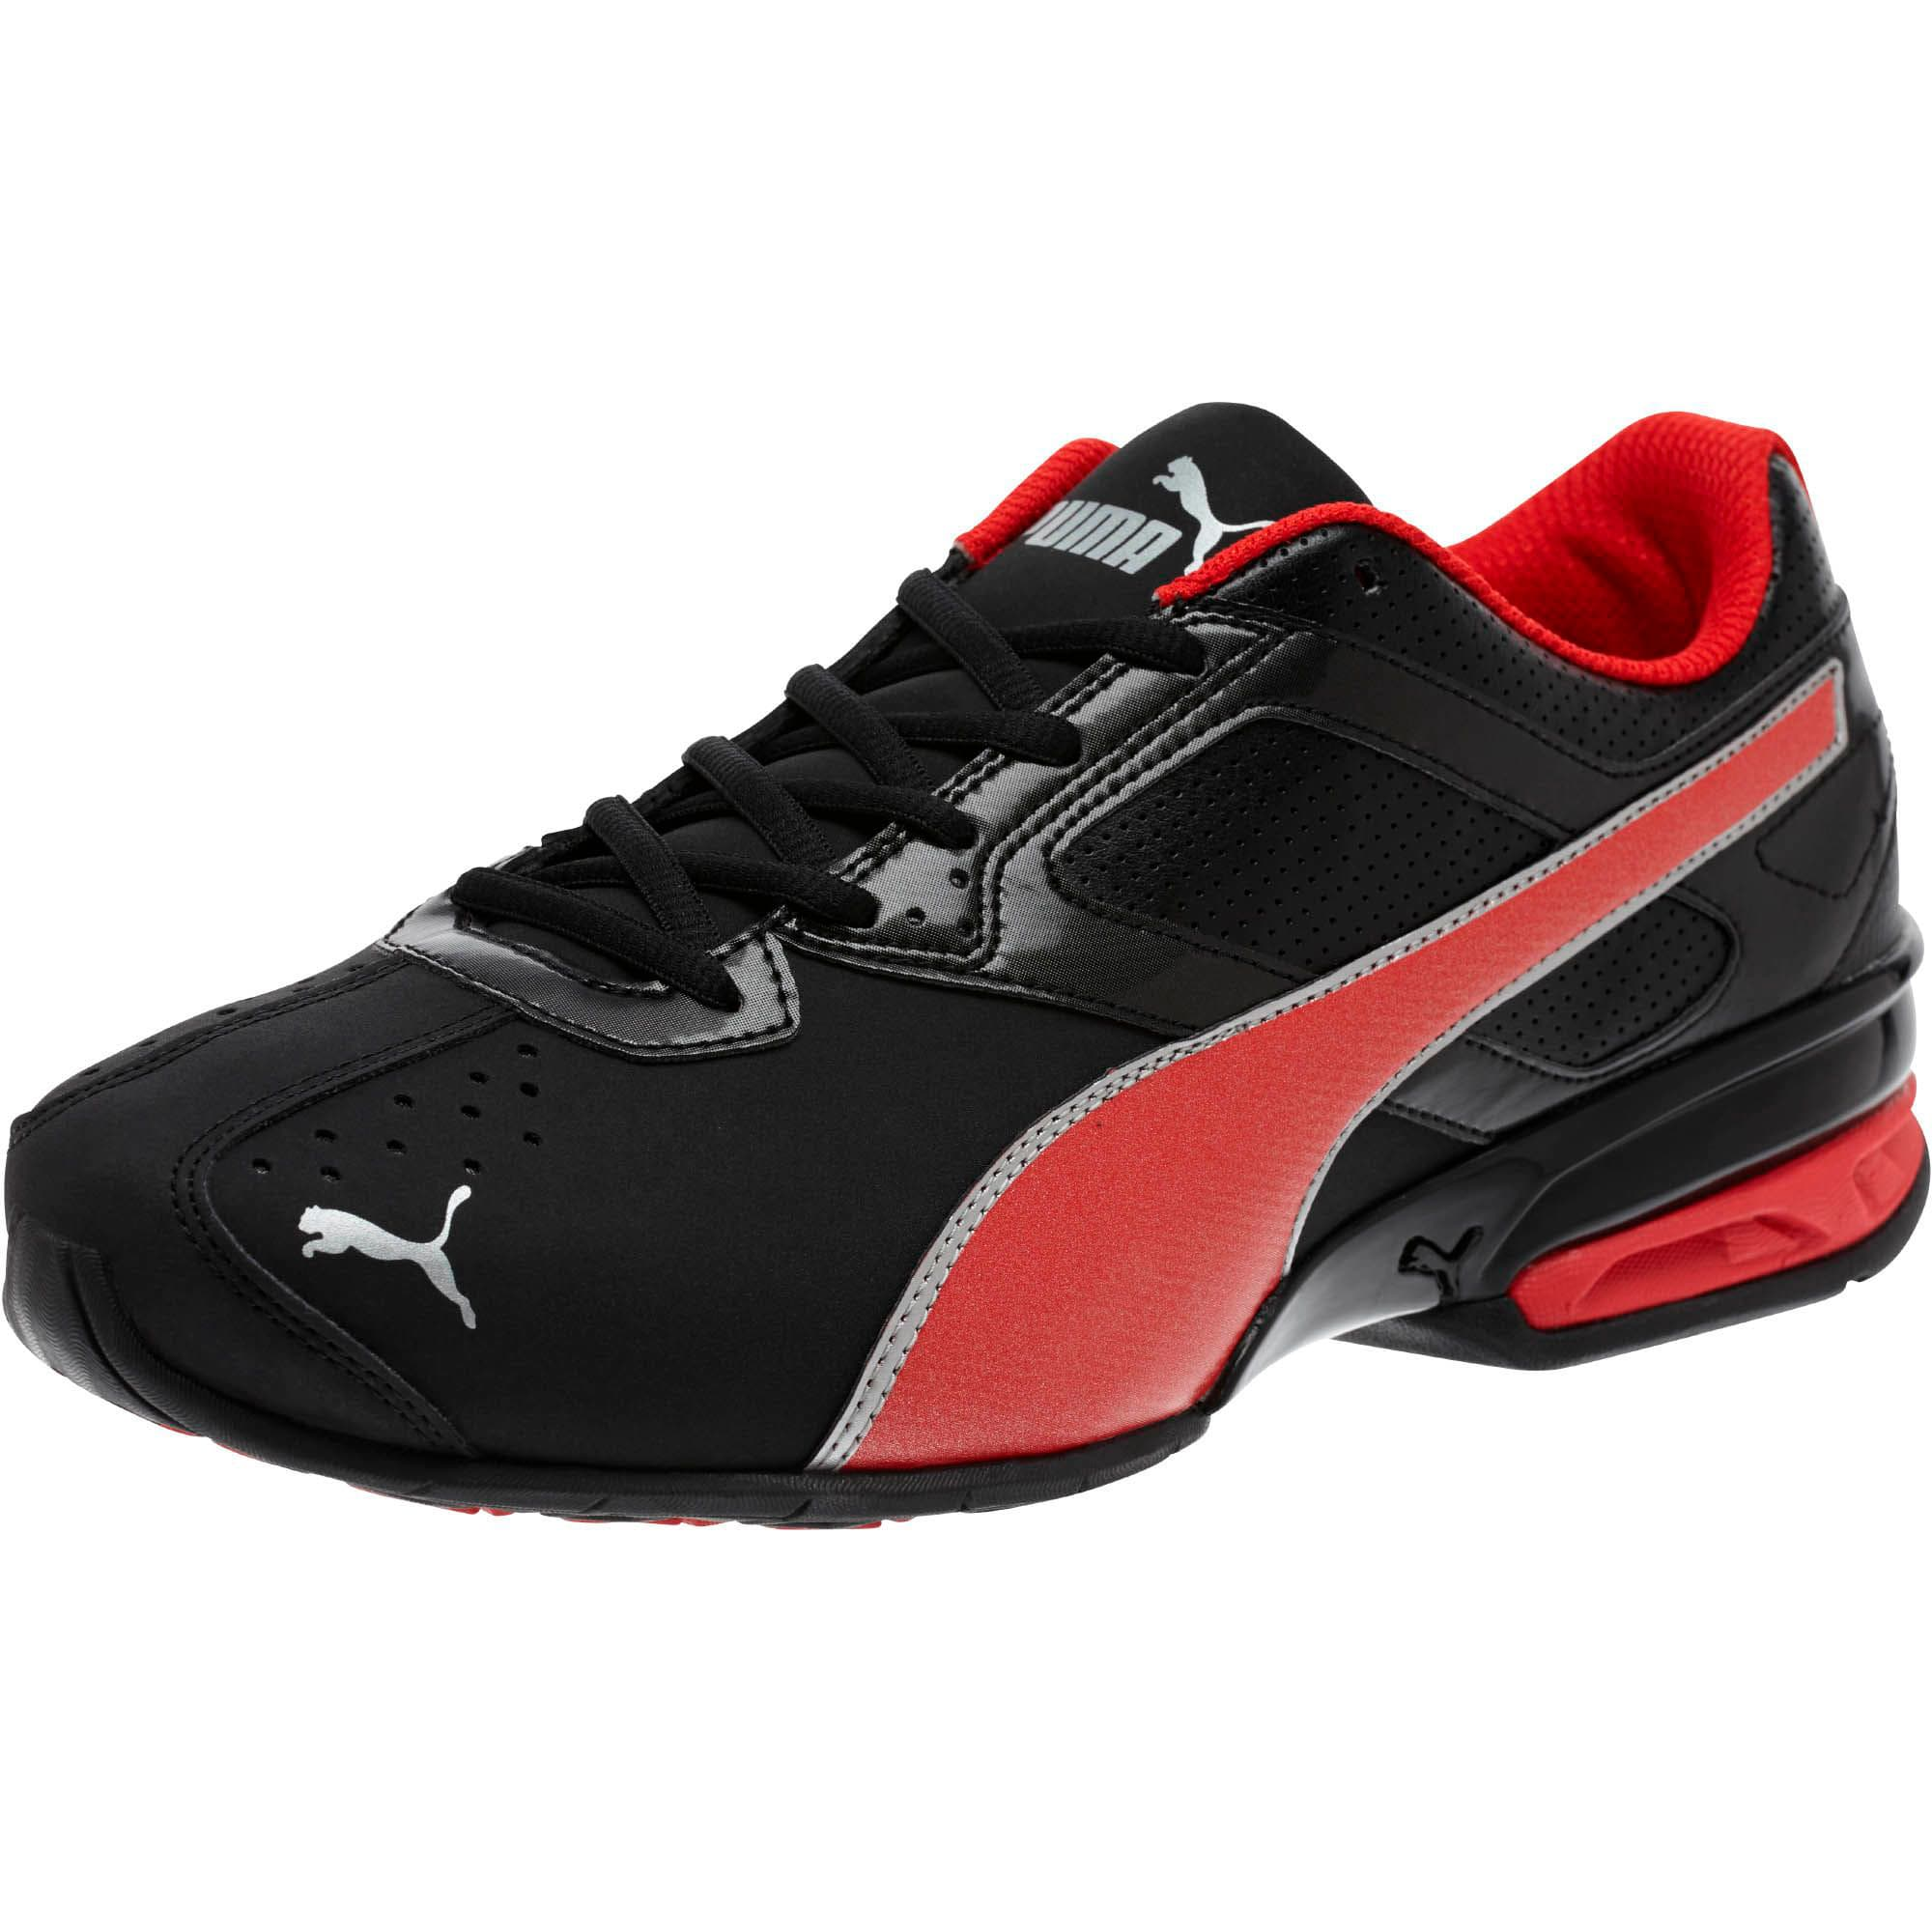 Thumbnail 1 of Tazon 6 FM Wide Men's Sneakers, Black-Red-Silver, medium